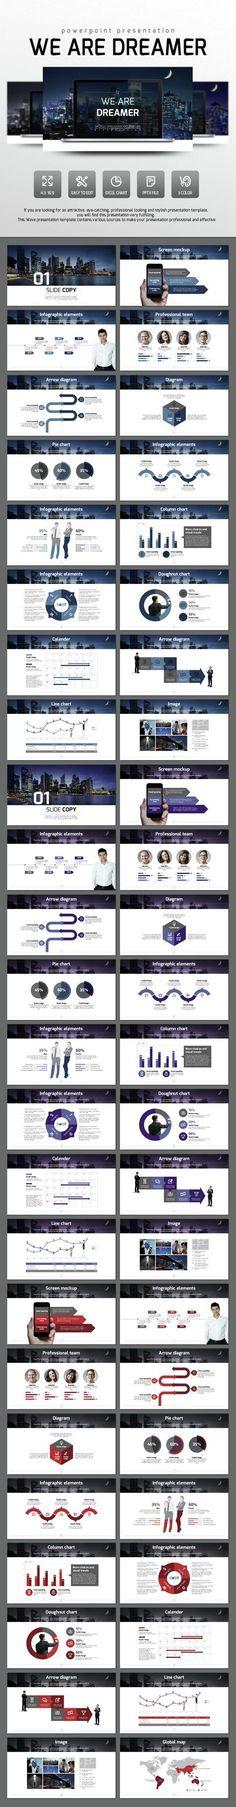 We Are Dreamer - PowerPoint Presentation Template #slides Download here: http://graphicriver.net/item/we-are-dreamer/14644348?ref=ksioks